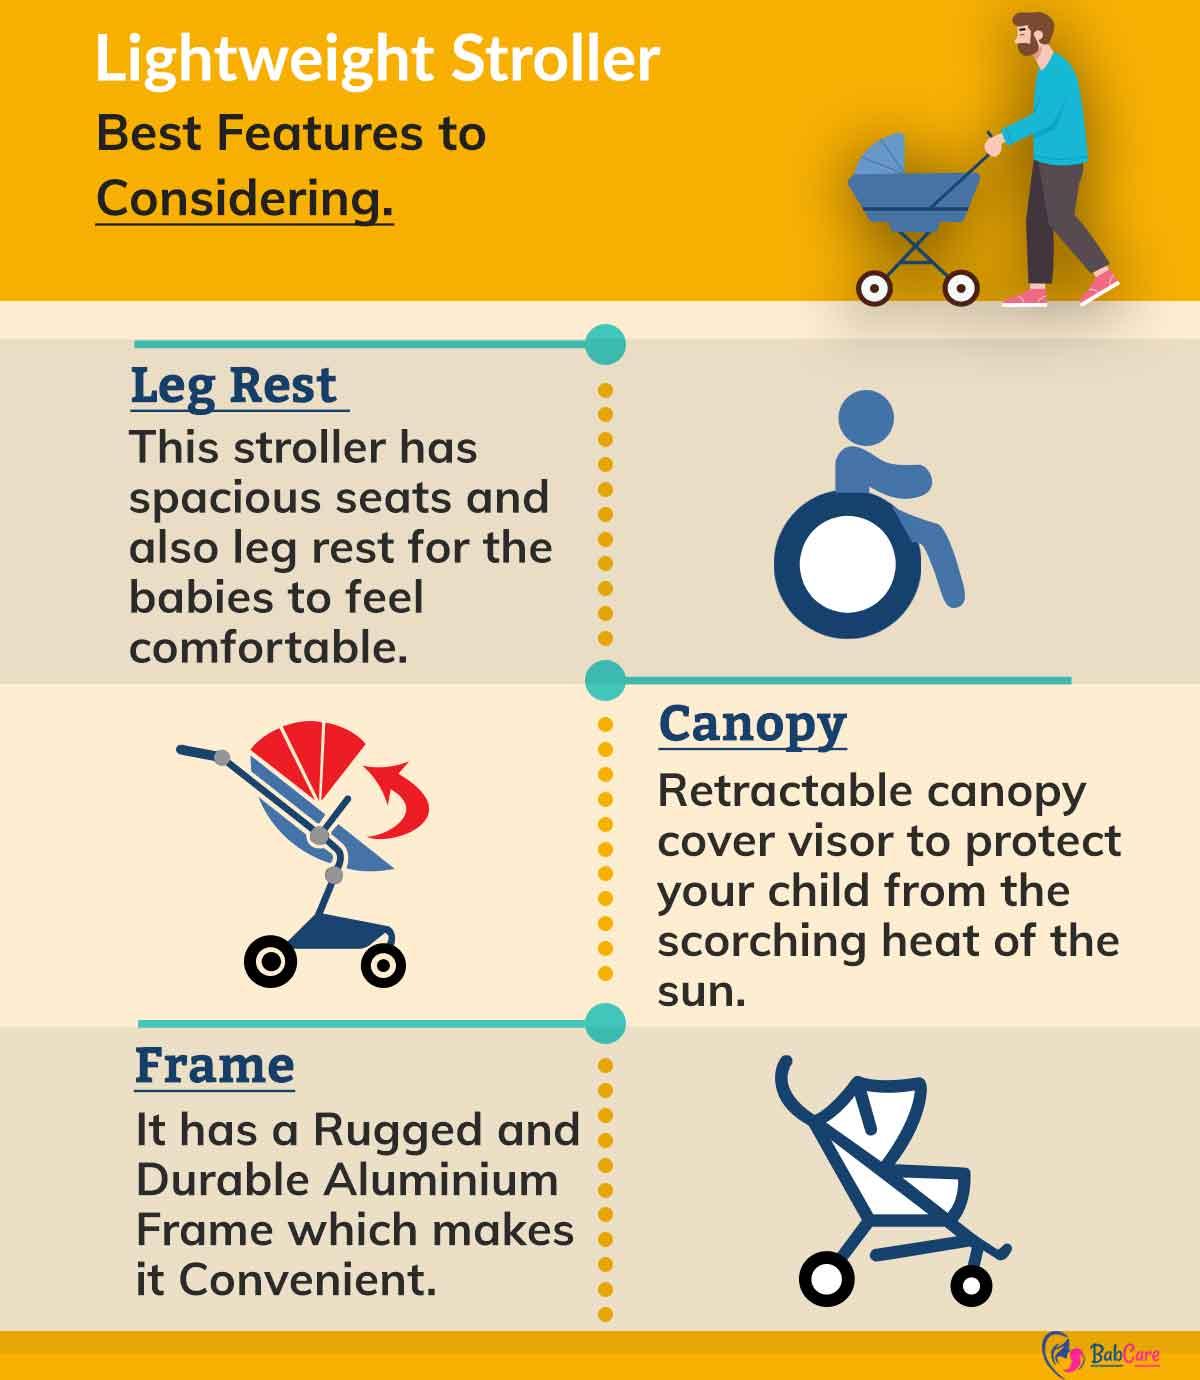 Portable Folding stroller has leg rest, canopy, aluminium frame